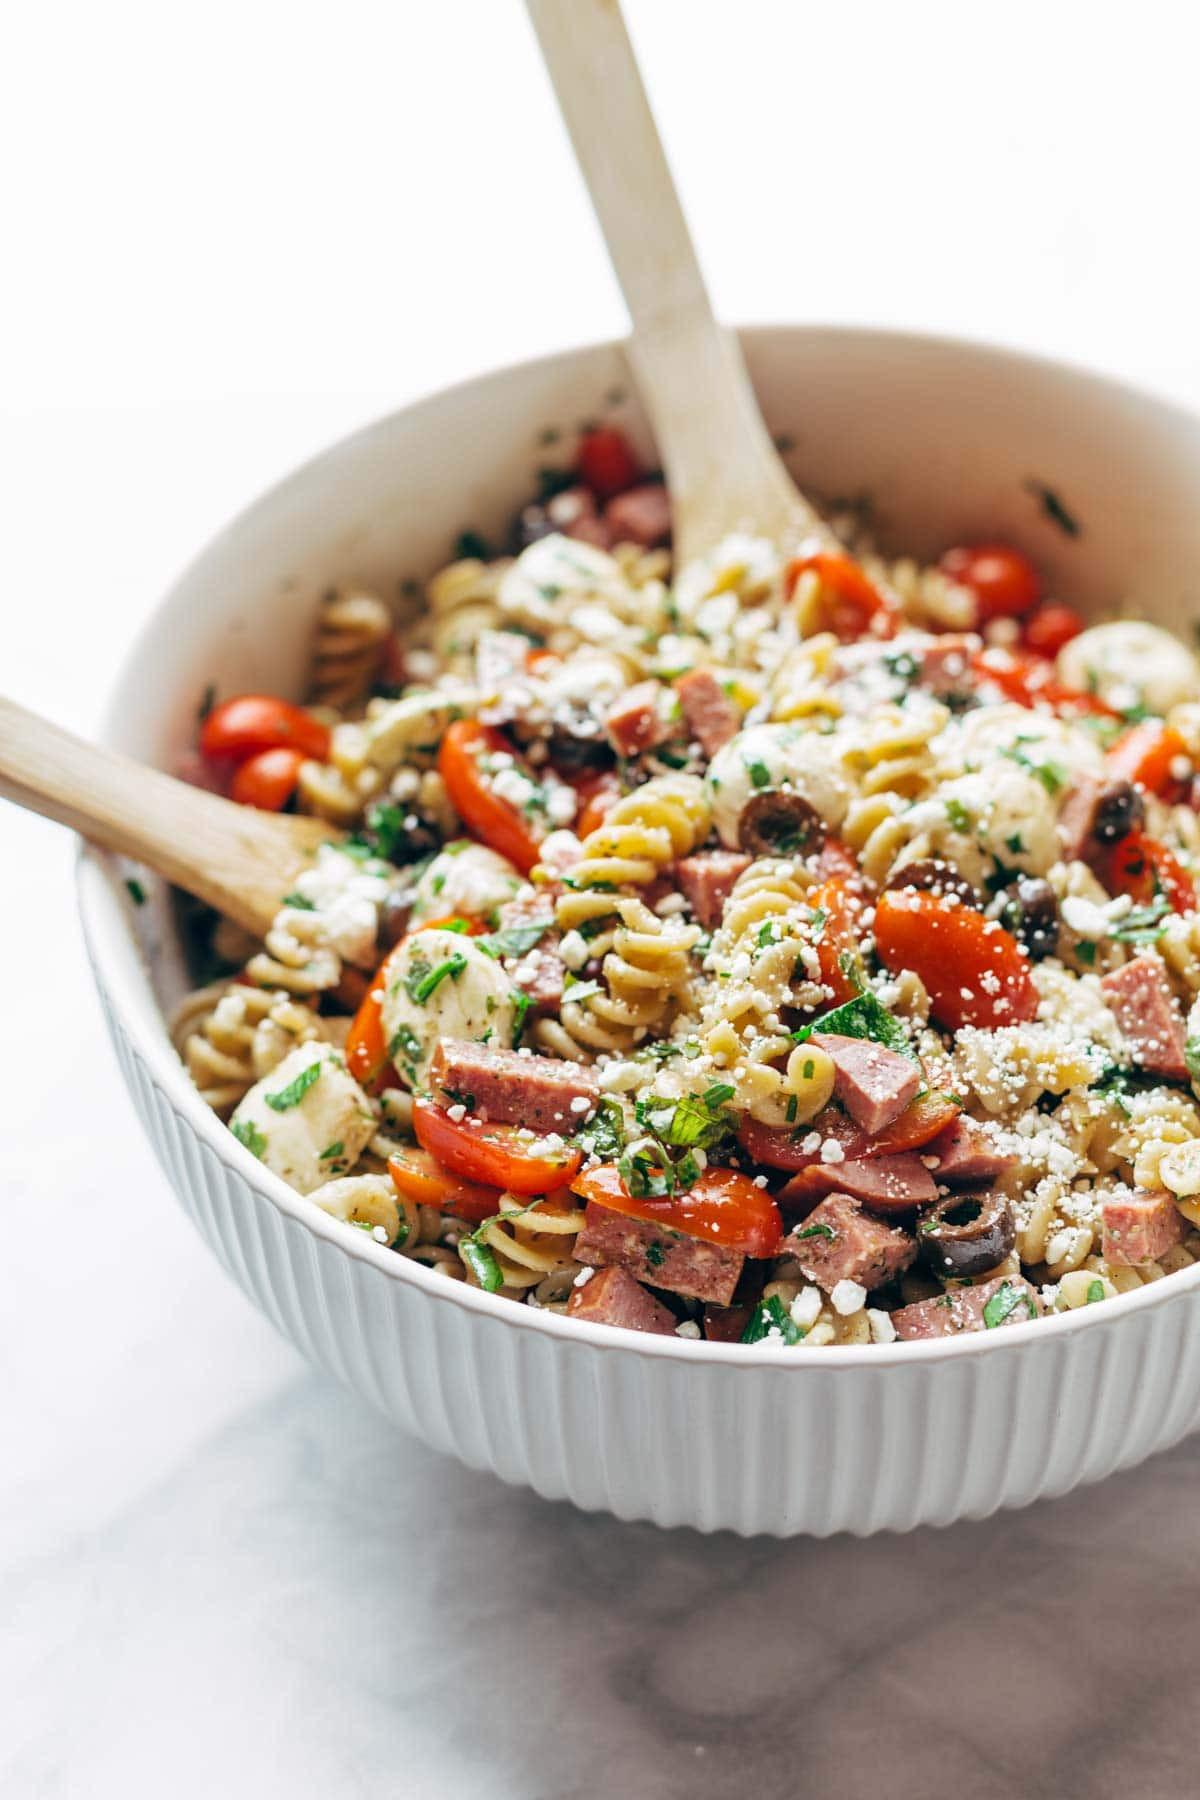 Easy Pasta Salad Recipes  Best Easy Italian Pasta Salad Recipe Pinch of Yum